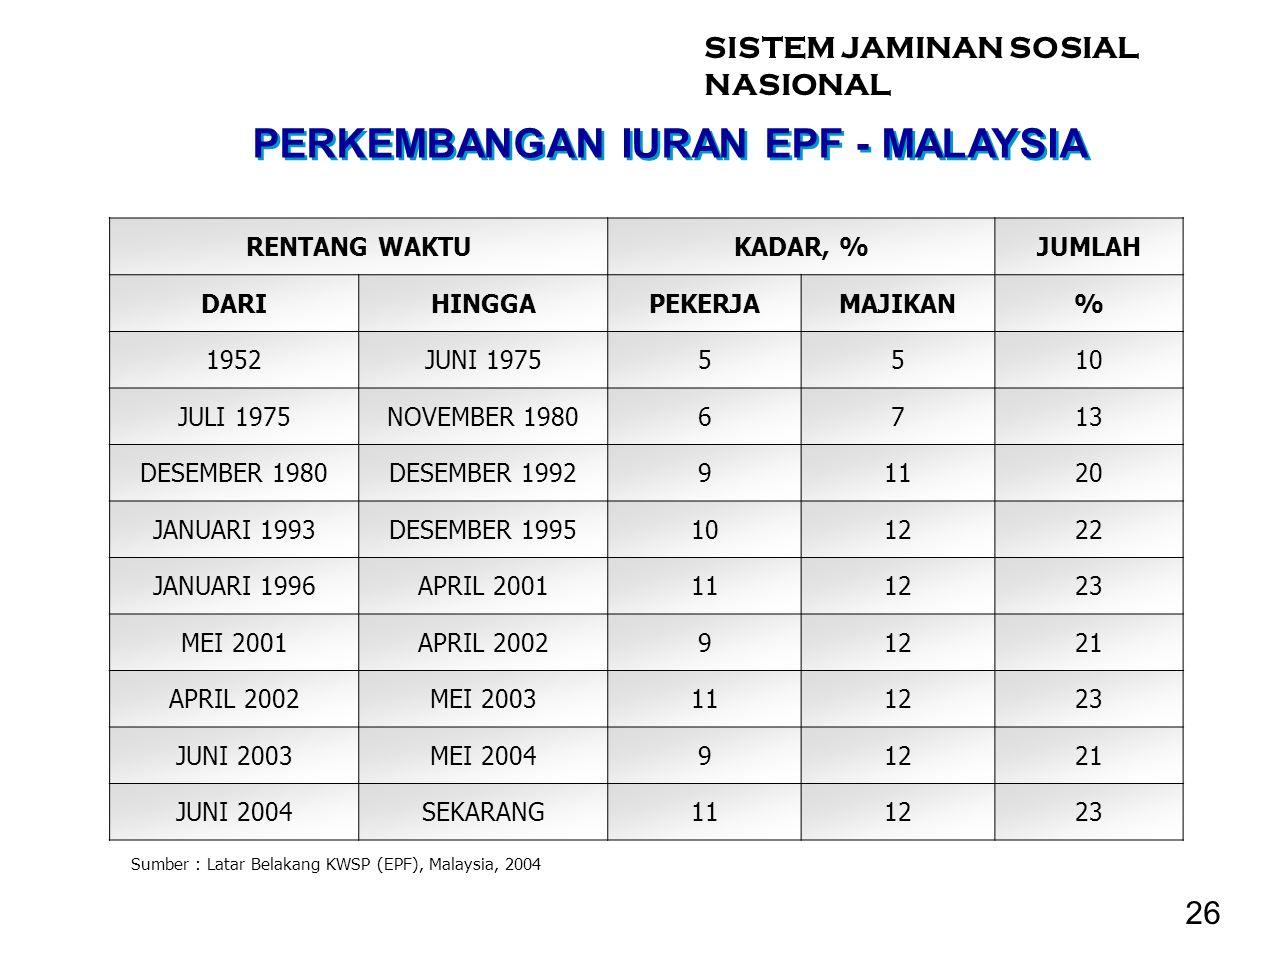 PERKEMBANGAN IURAN EPF - MALAYSIA